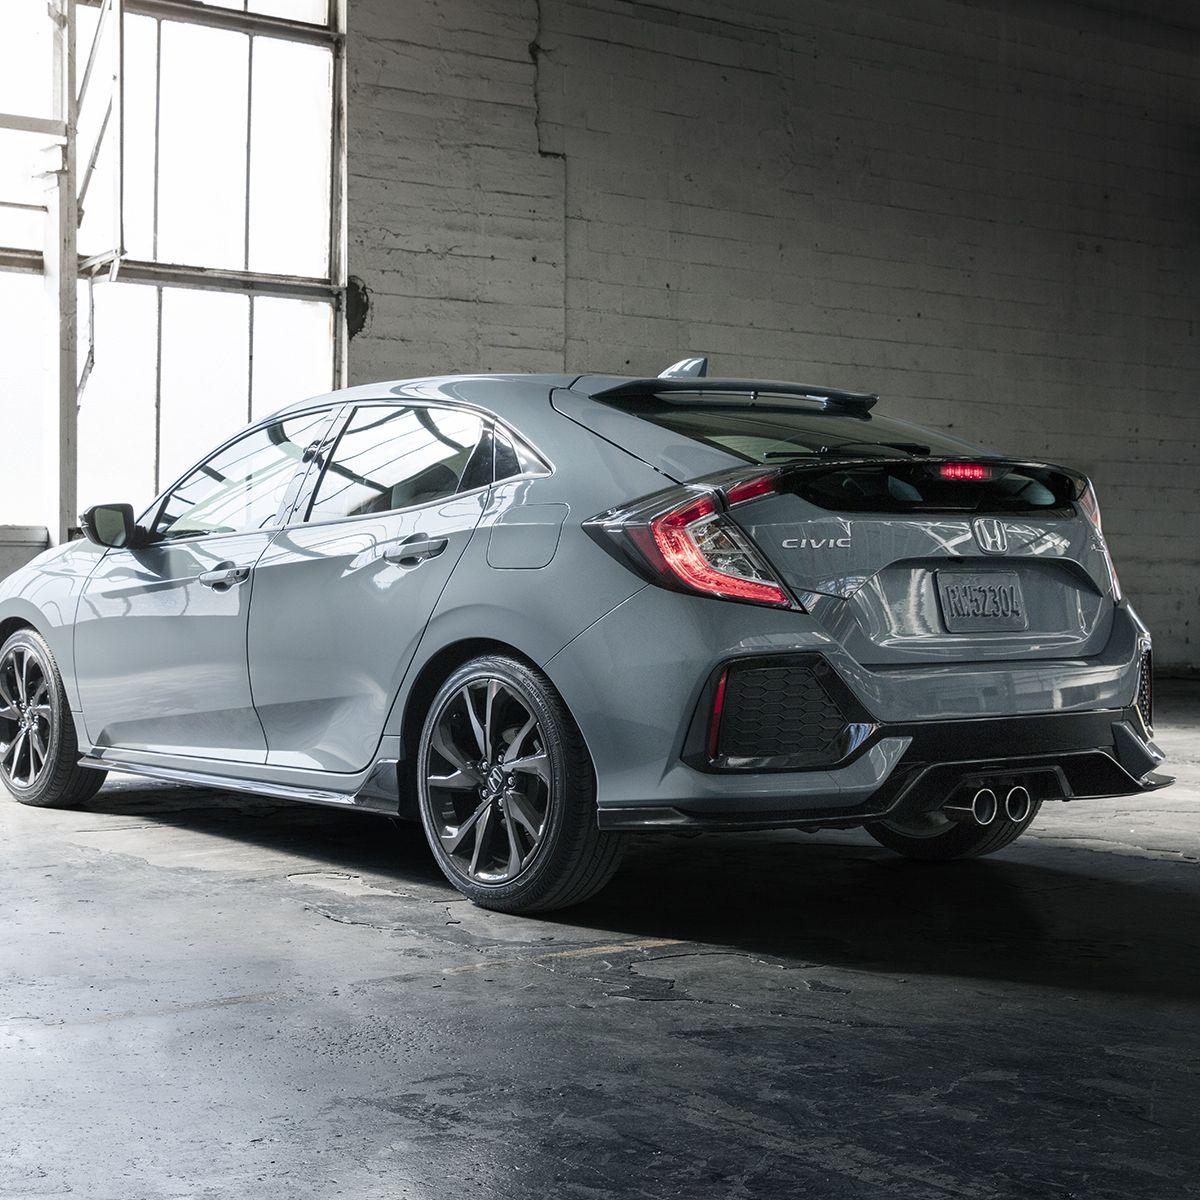 Make a bold entrance with a 2017 Honda Civic Hatchback